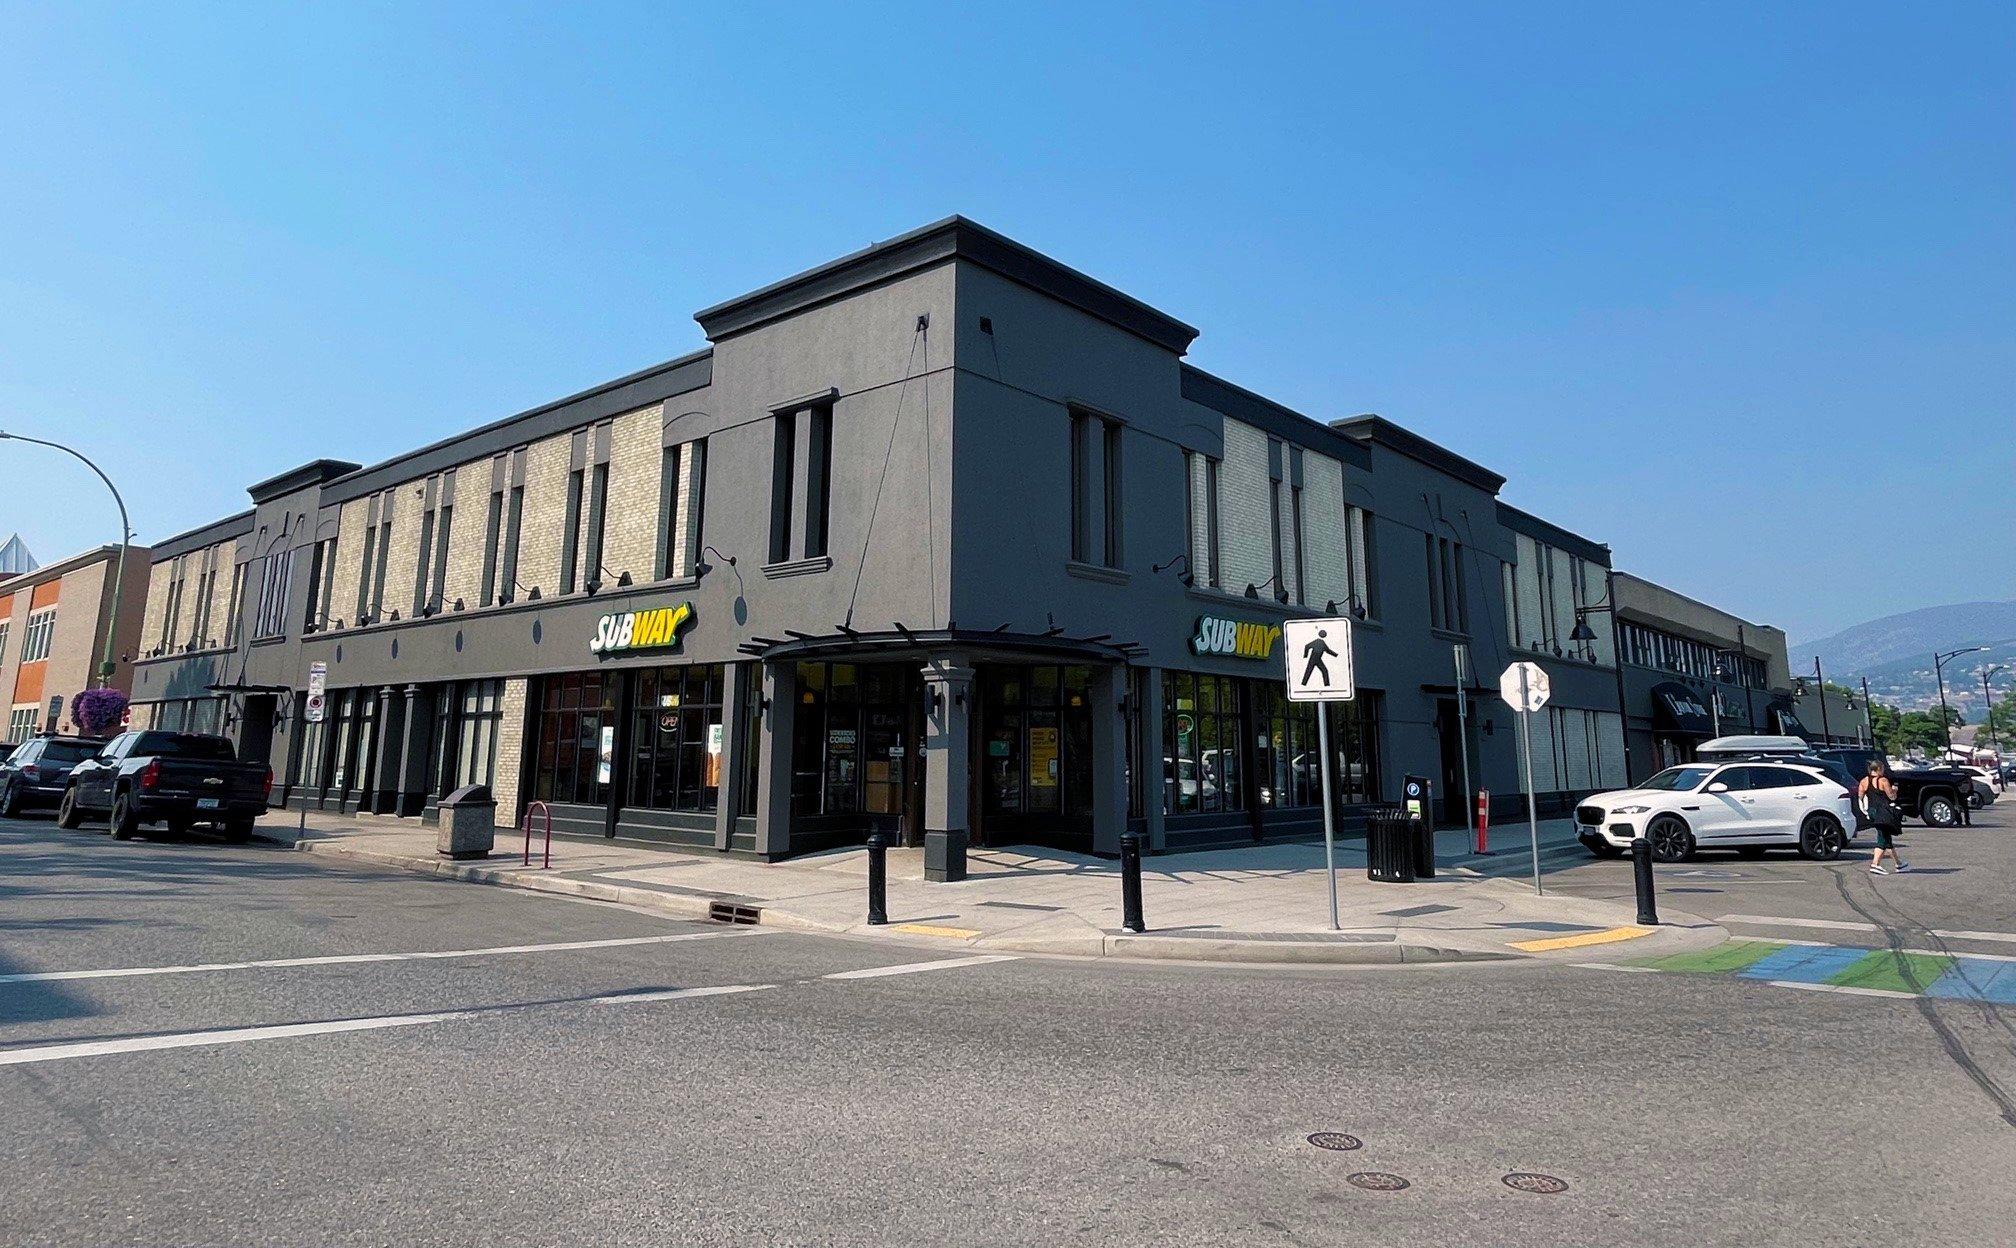 1460 Pandosy Street, Kelowna, BC - Downtown Kelowna Professional Office Space